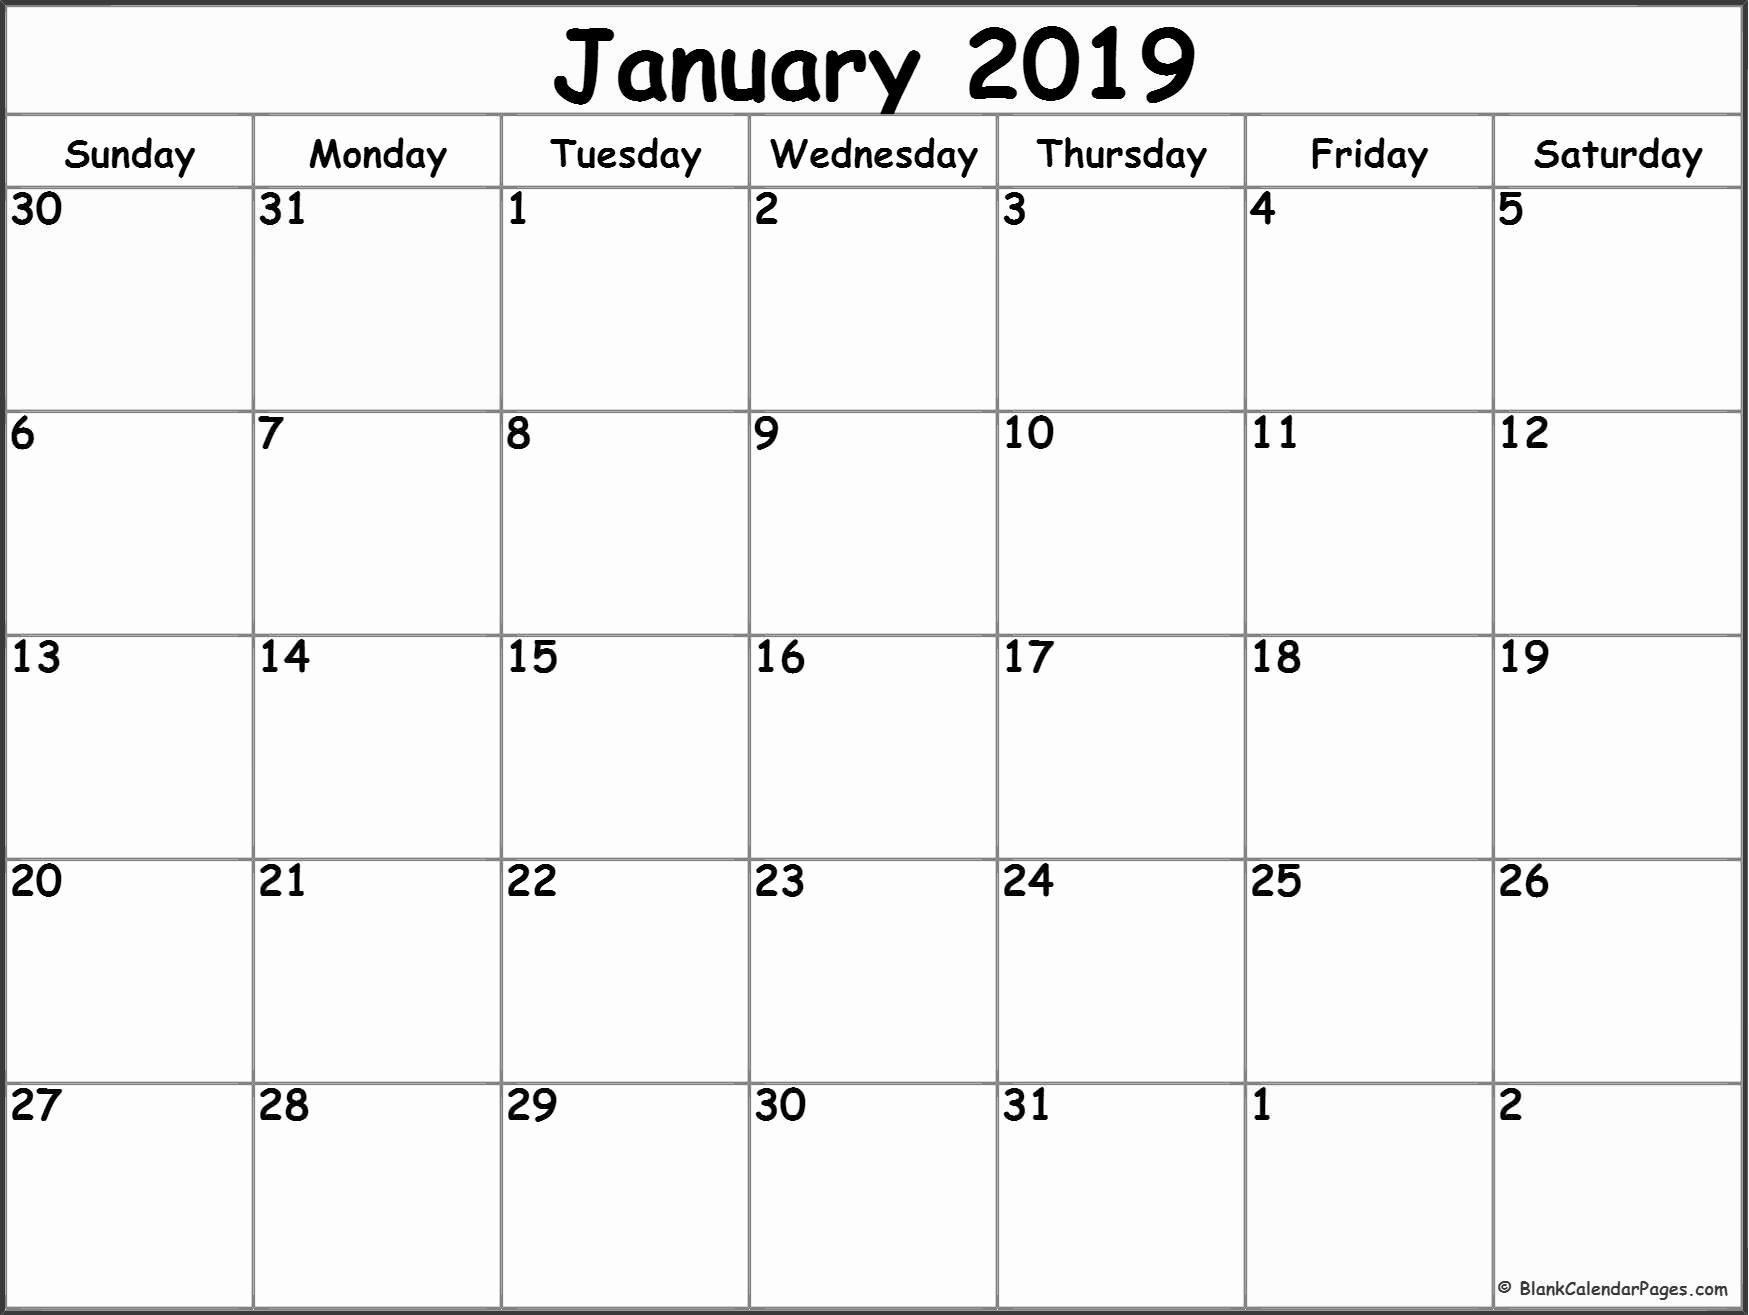 Blank Calendar Template 2019 Inspirational January 2019 Blank Calendar Templates